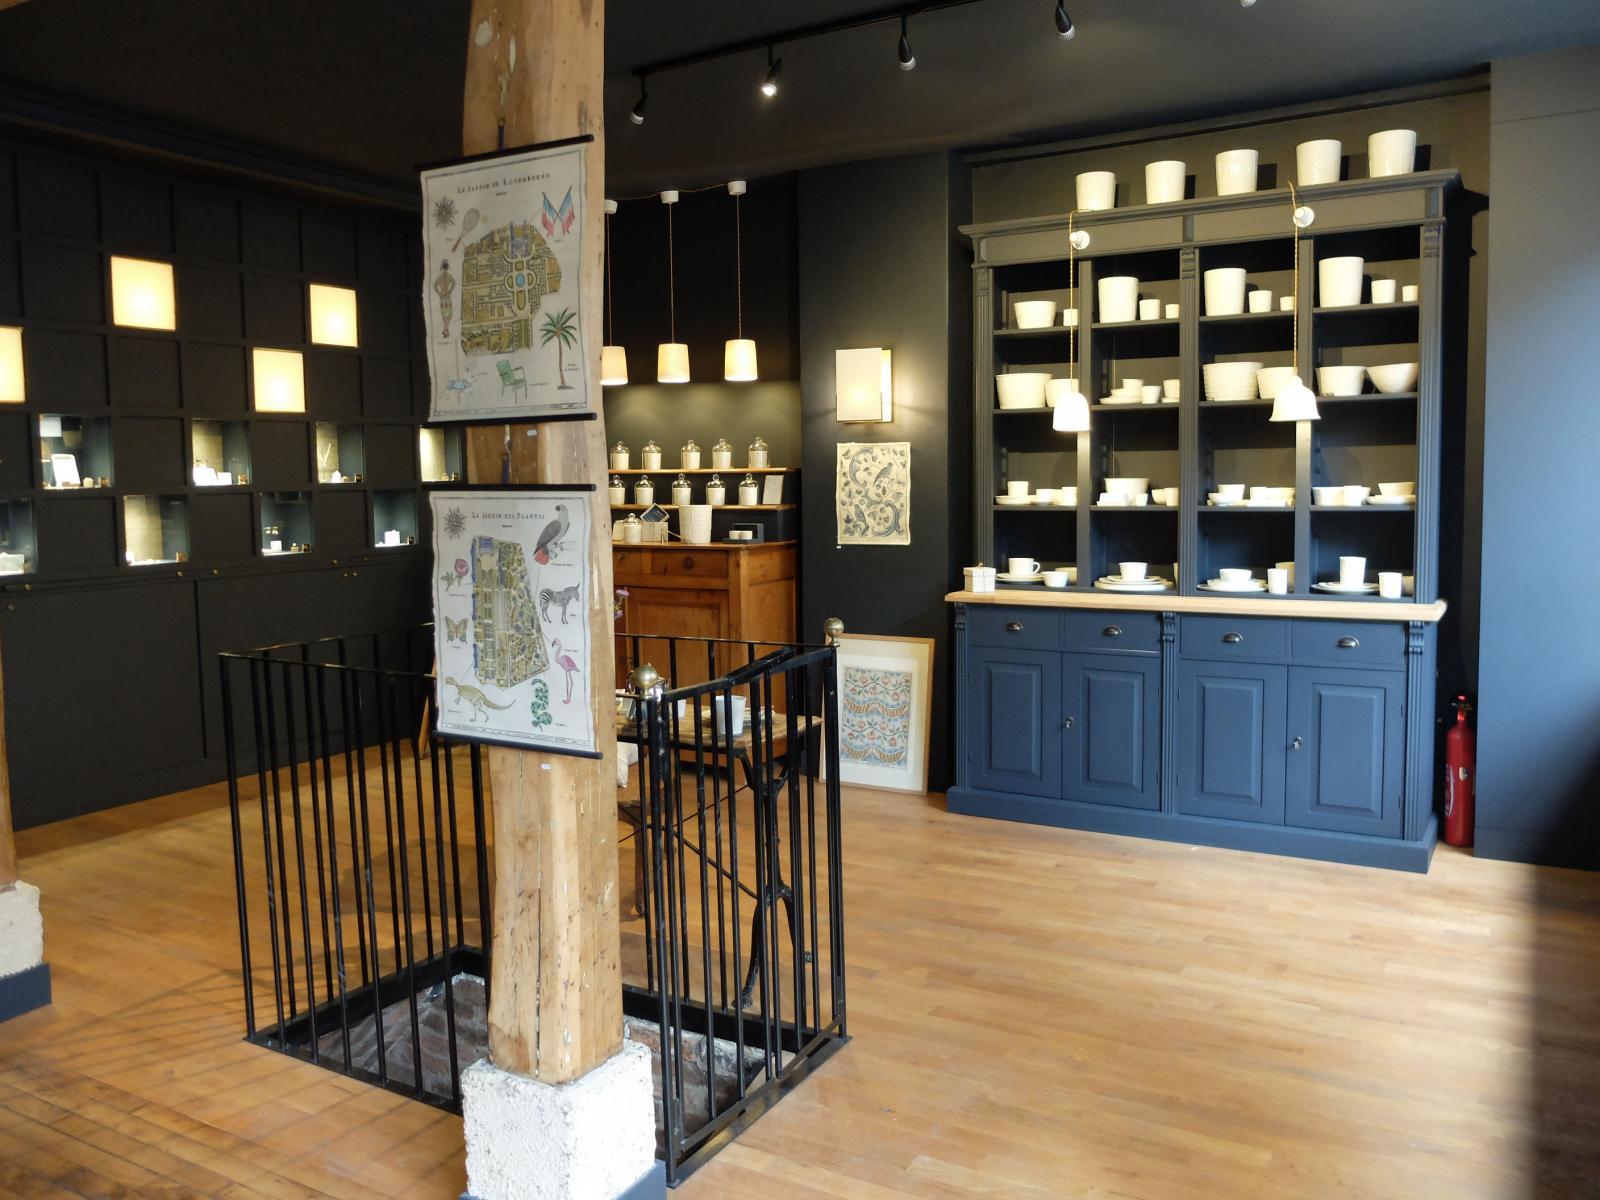 el gance et simplicit chez alix d reynis madame d core. Black Bedroom Furniture Sets. Home Design Ideas